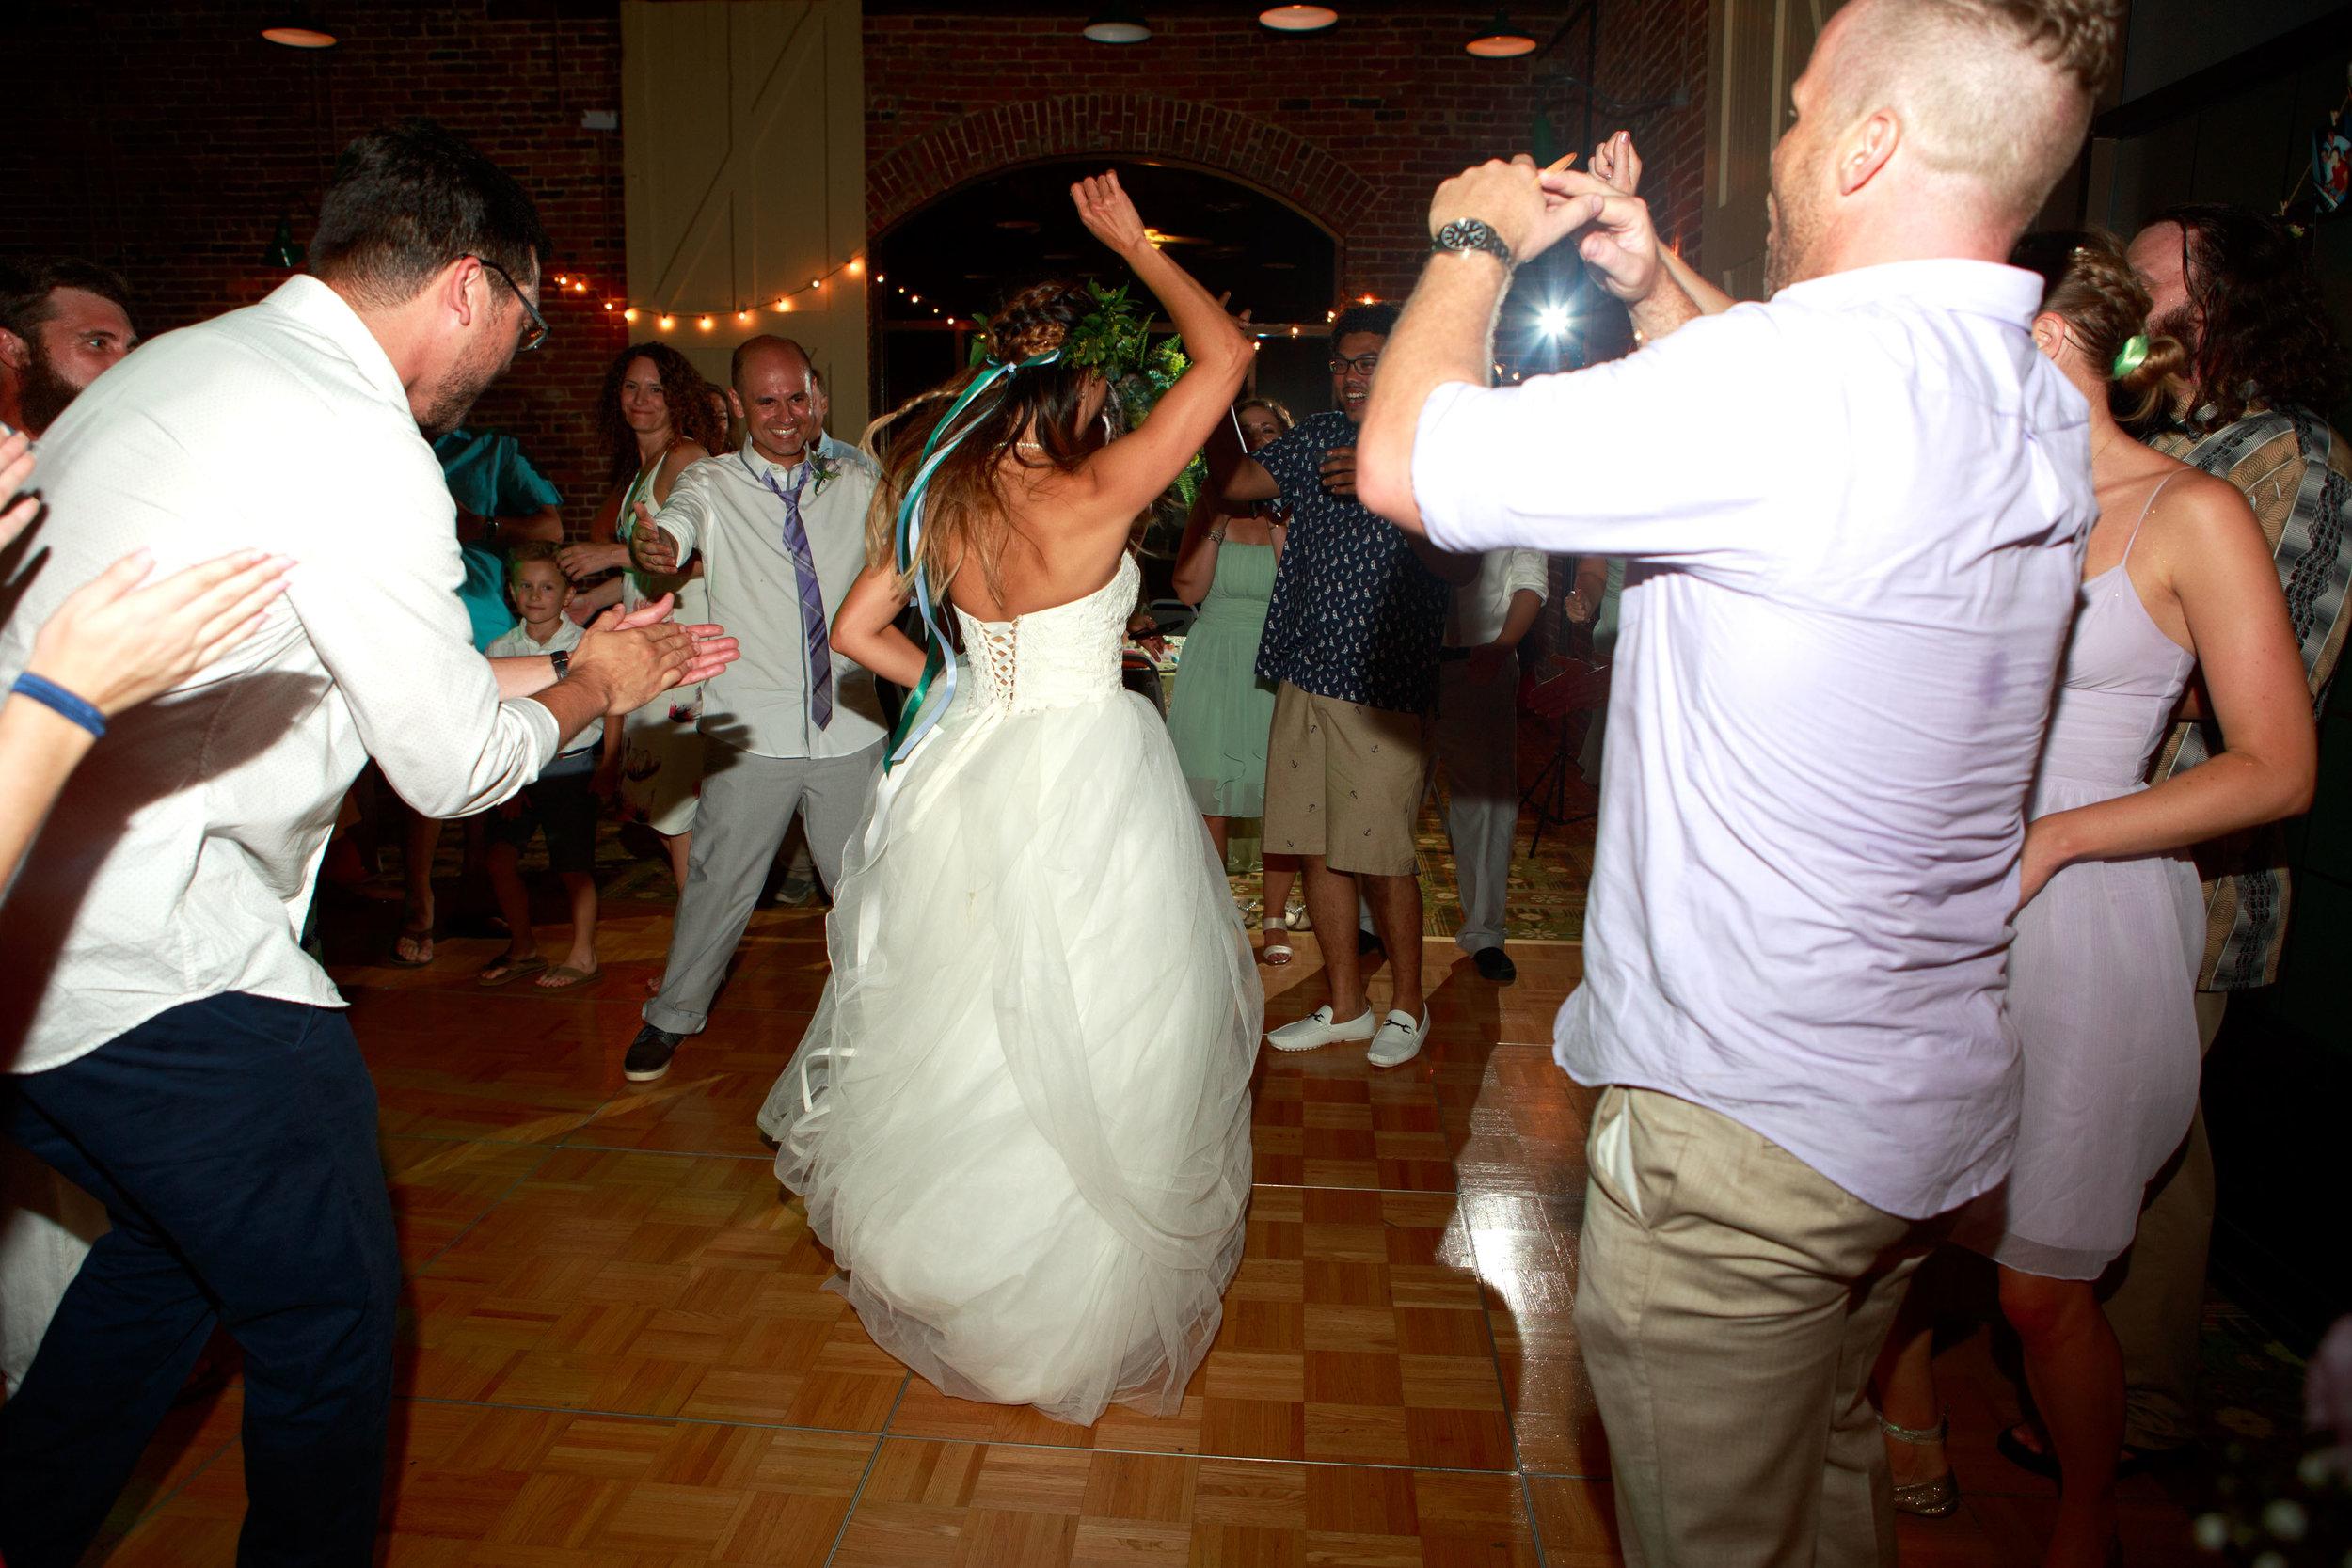 North_Carolina_Wedding_Photographer_Tiffany_Abruzzo_Reception_275.jpg